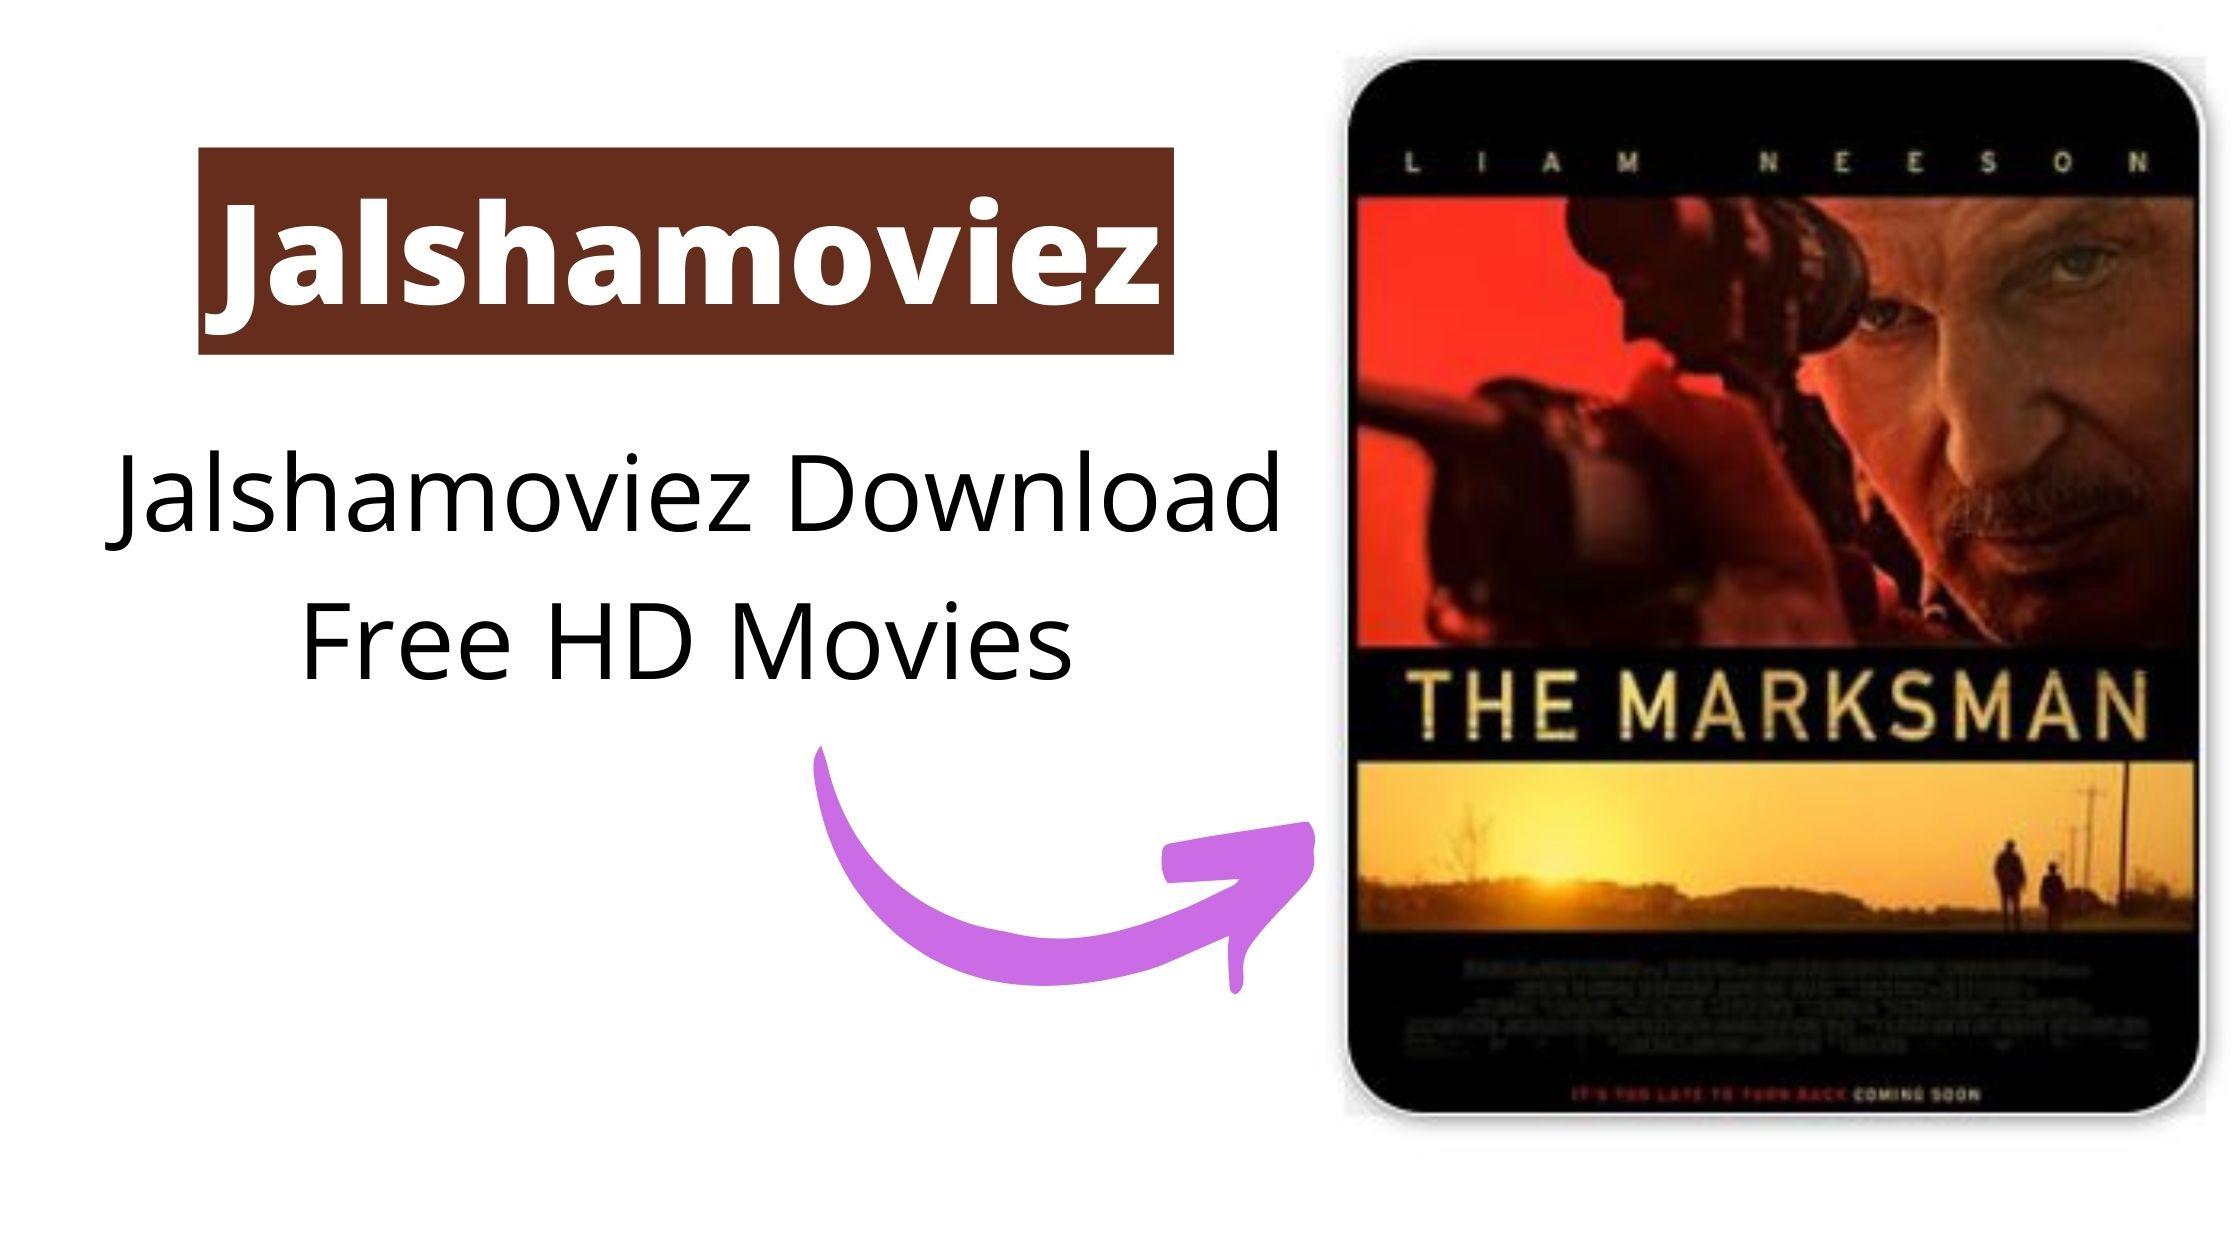 Jalshamoviez Download Free HD Movies